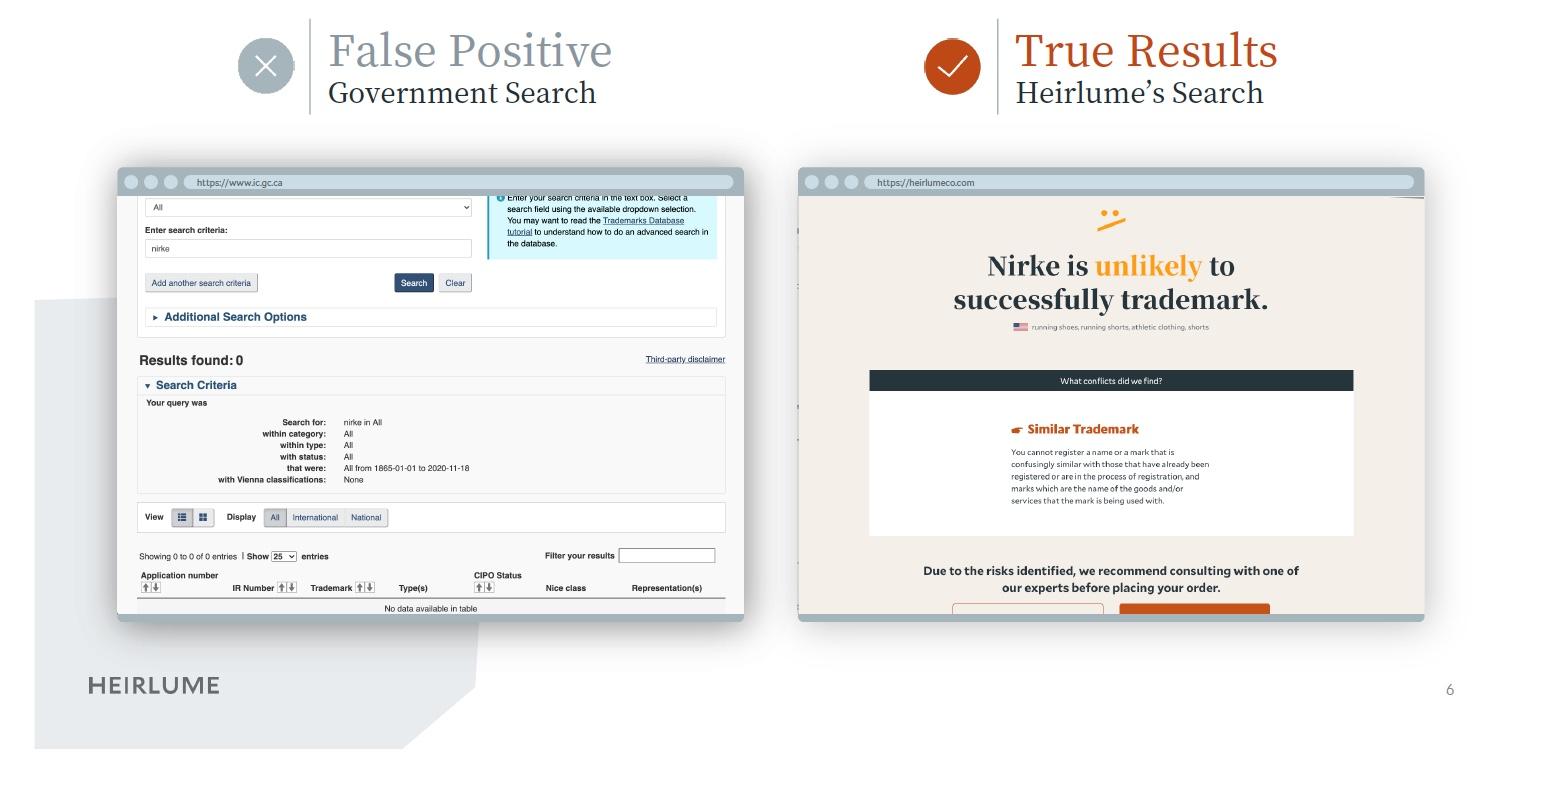 Heirlume-Trademark-Search